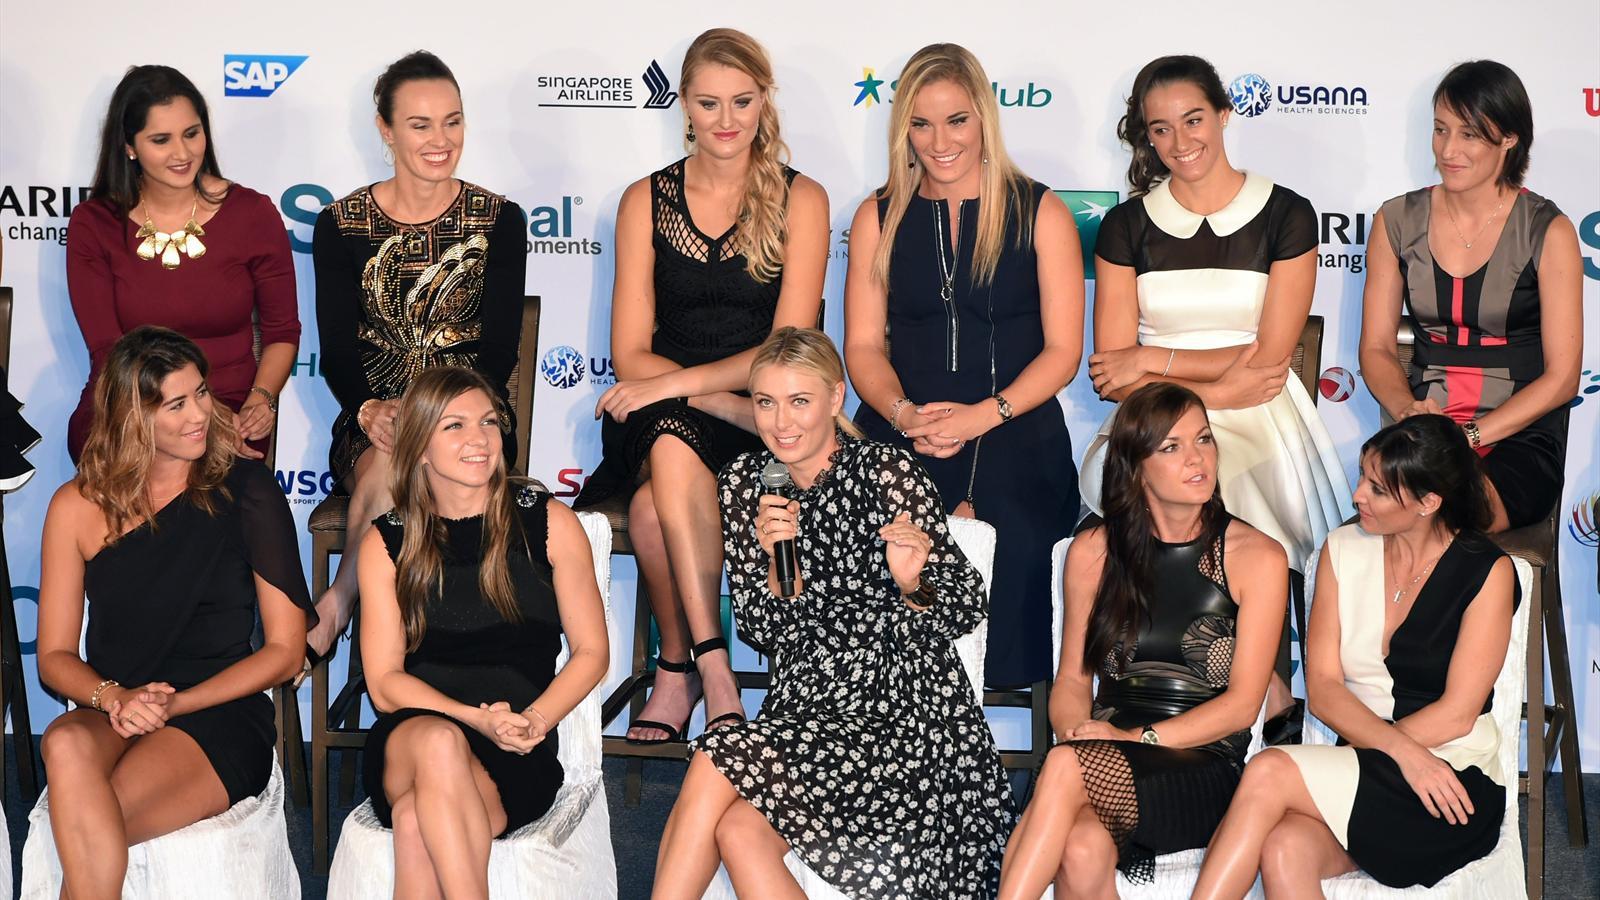 Radwanska, Pennetta, Halep, Sharapova, Muguruza, Kerber, Kvitova, Safarova, Wta Finals